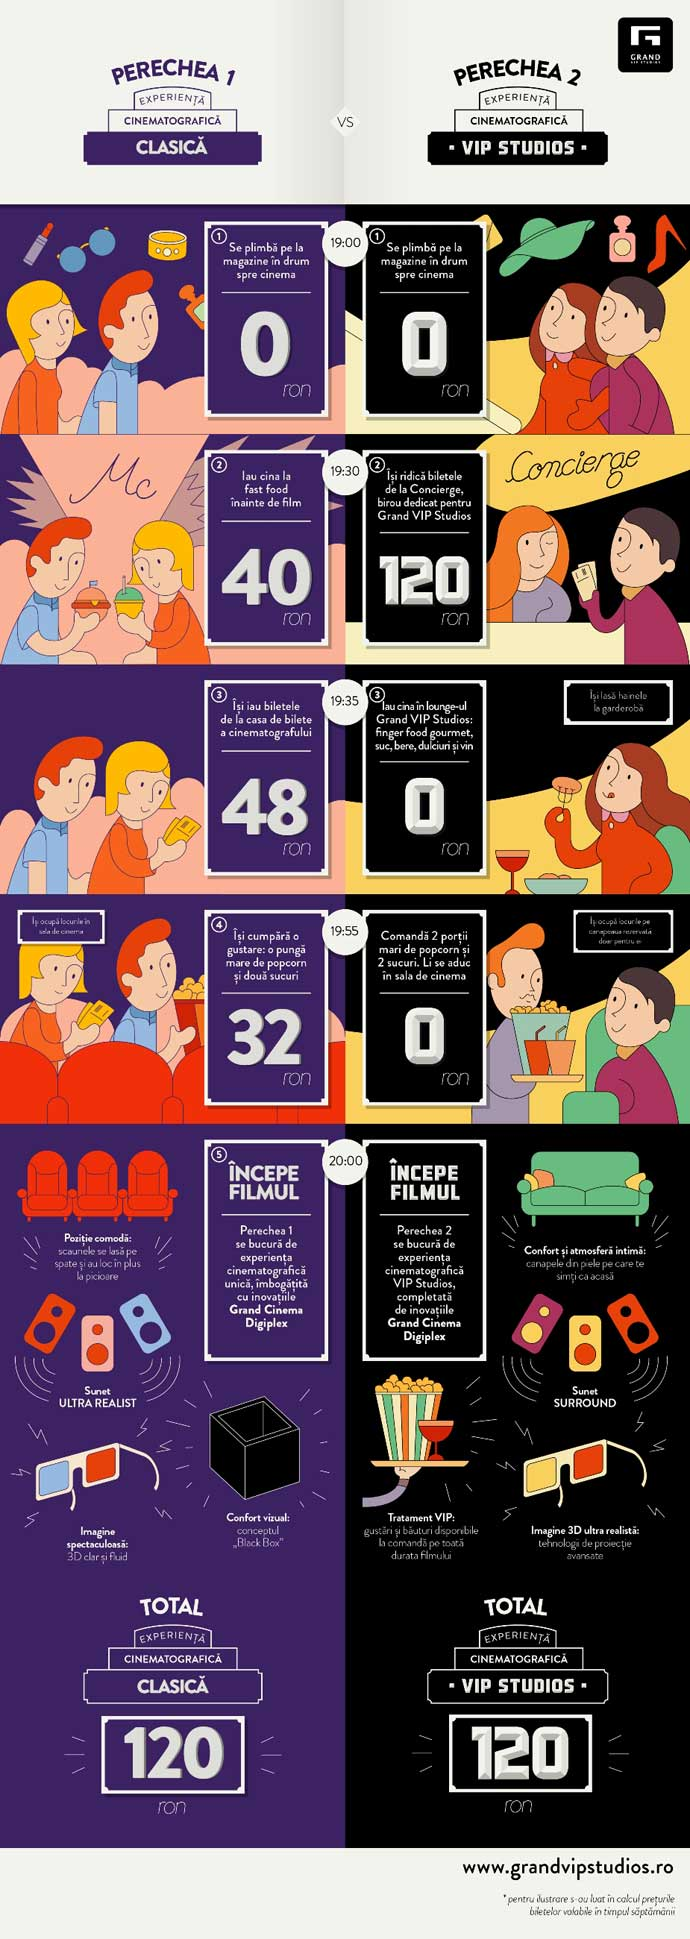 infografic-Grand-Vip-Studios